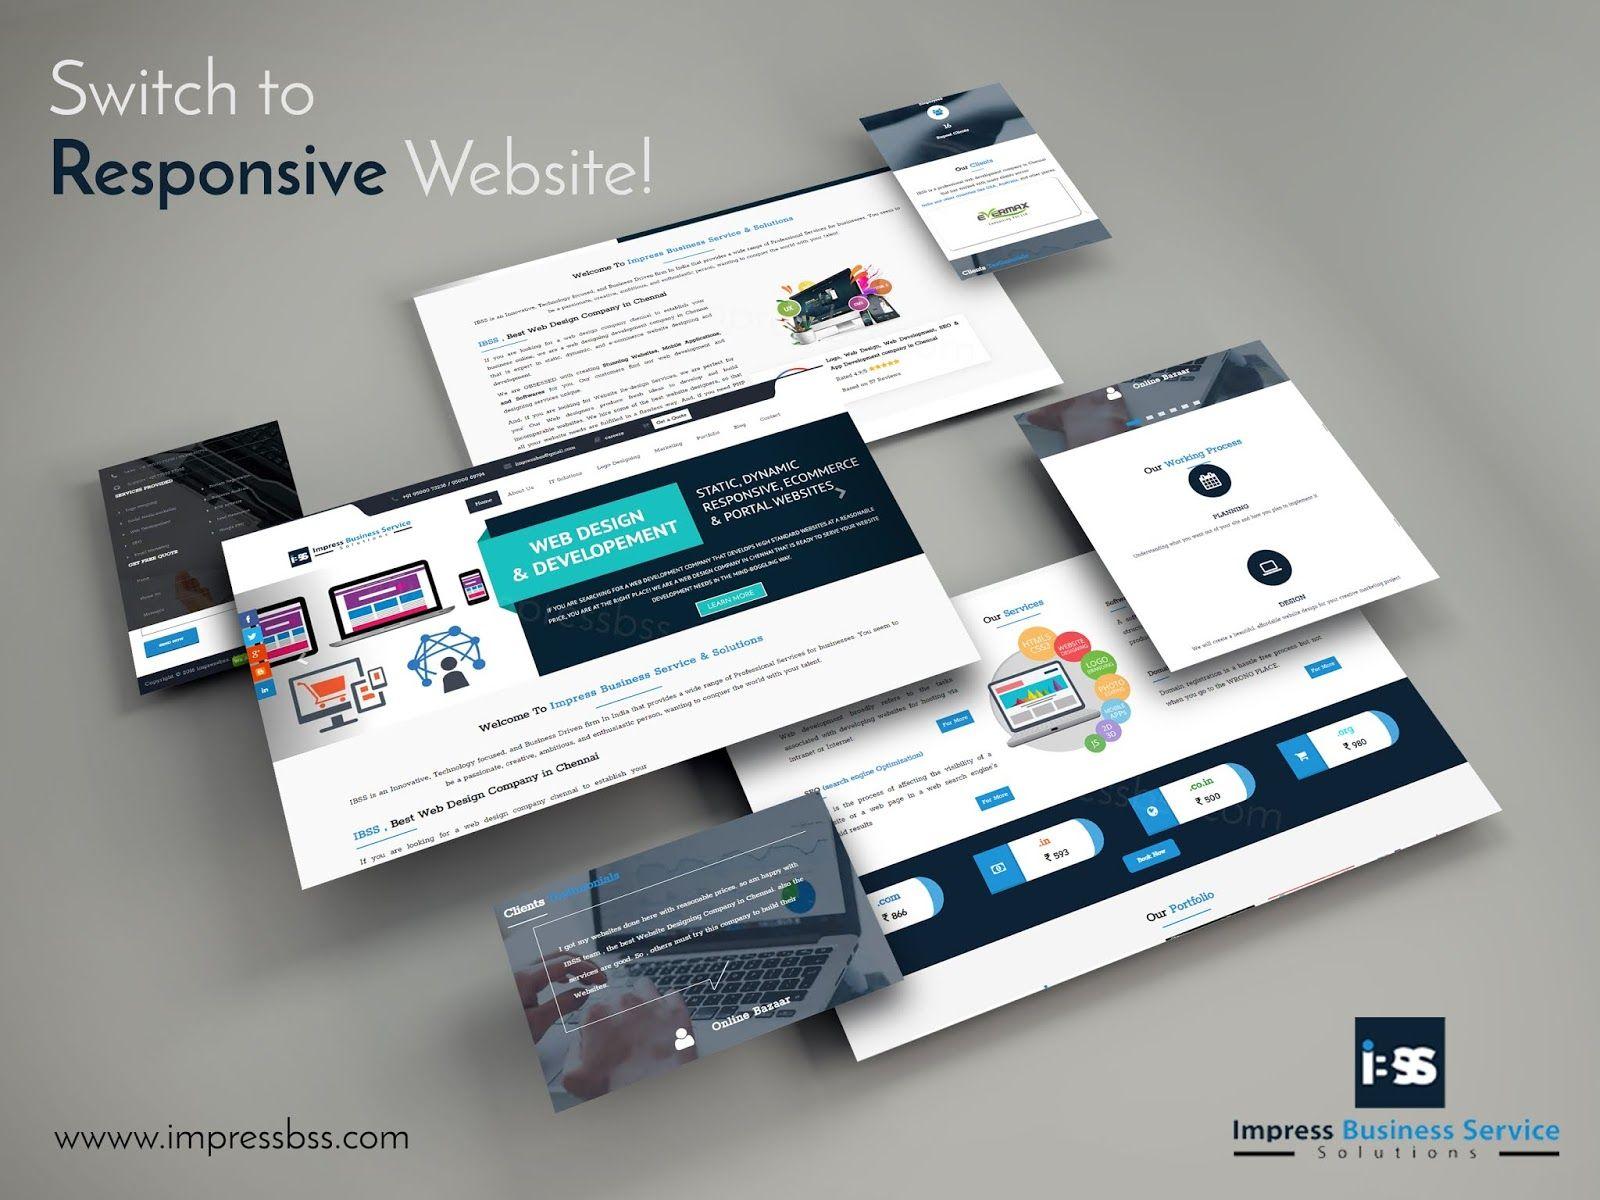 Web Design Company In Chennai Best Web Design Company In Chennai Web Design Company Web Design Pricing Fun Website Design